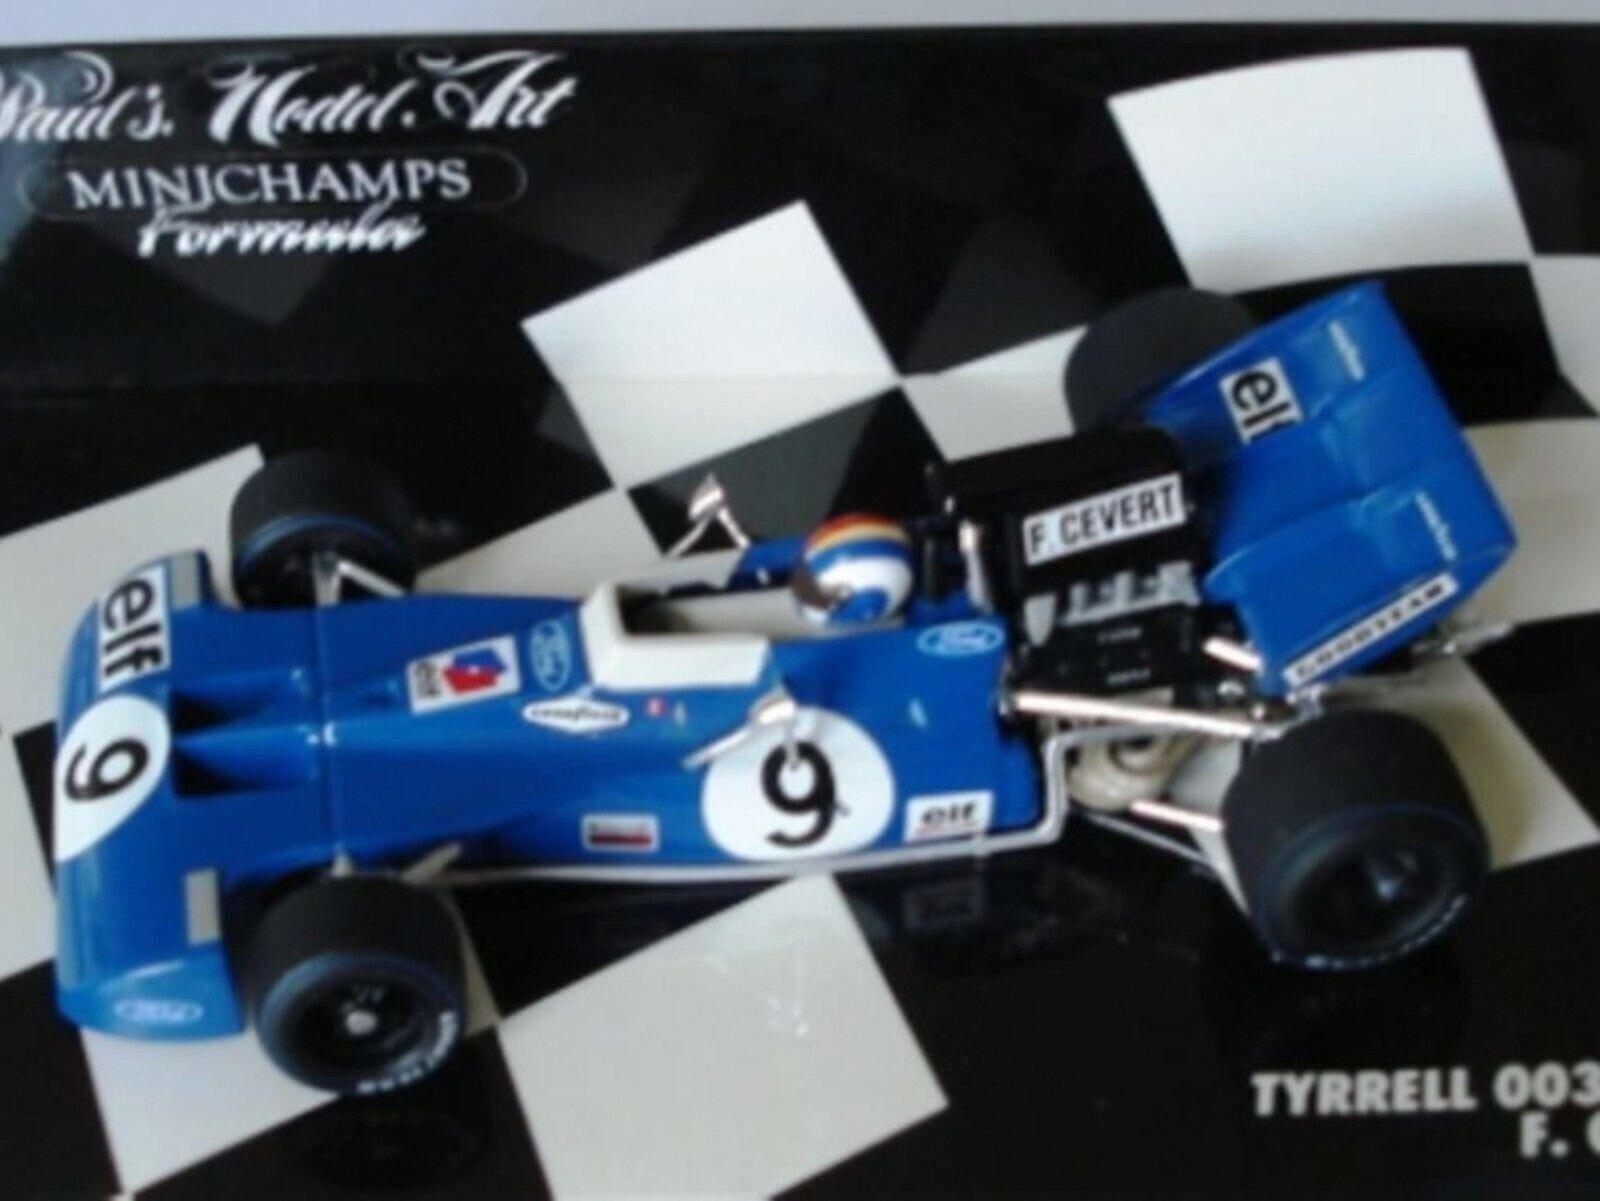 WOW estremamente raro TYRRELL 003 FORD  9 CEverde WINNER GP USA 1971 1 43 Minichamps